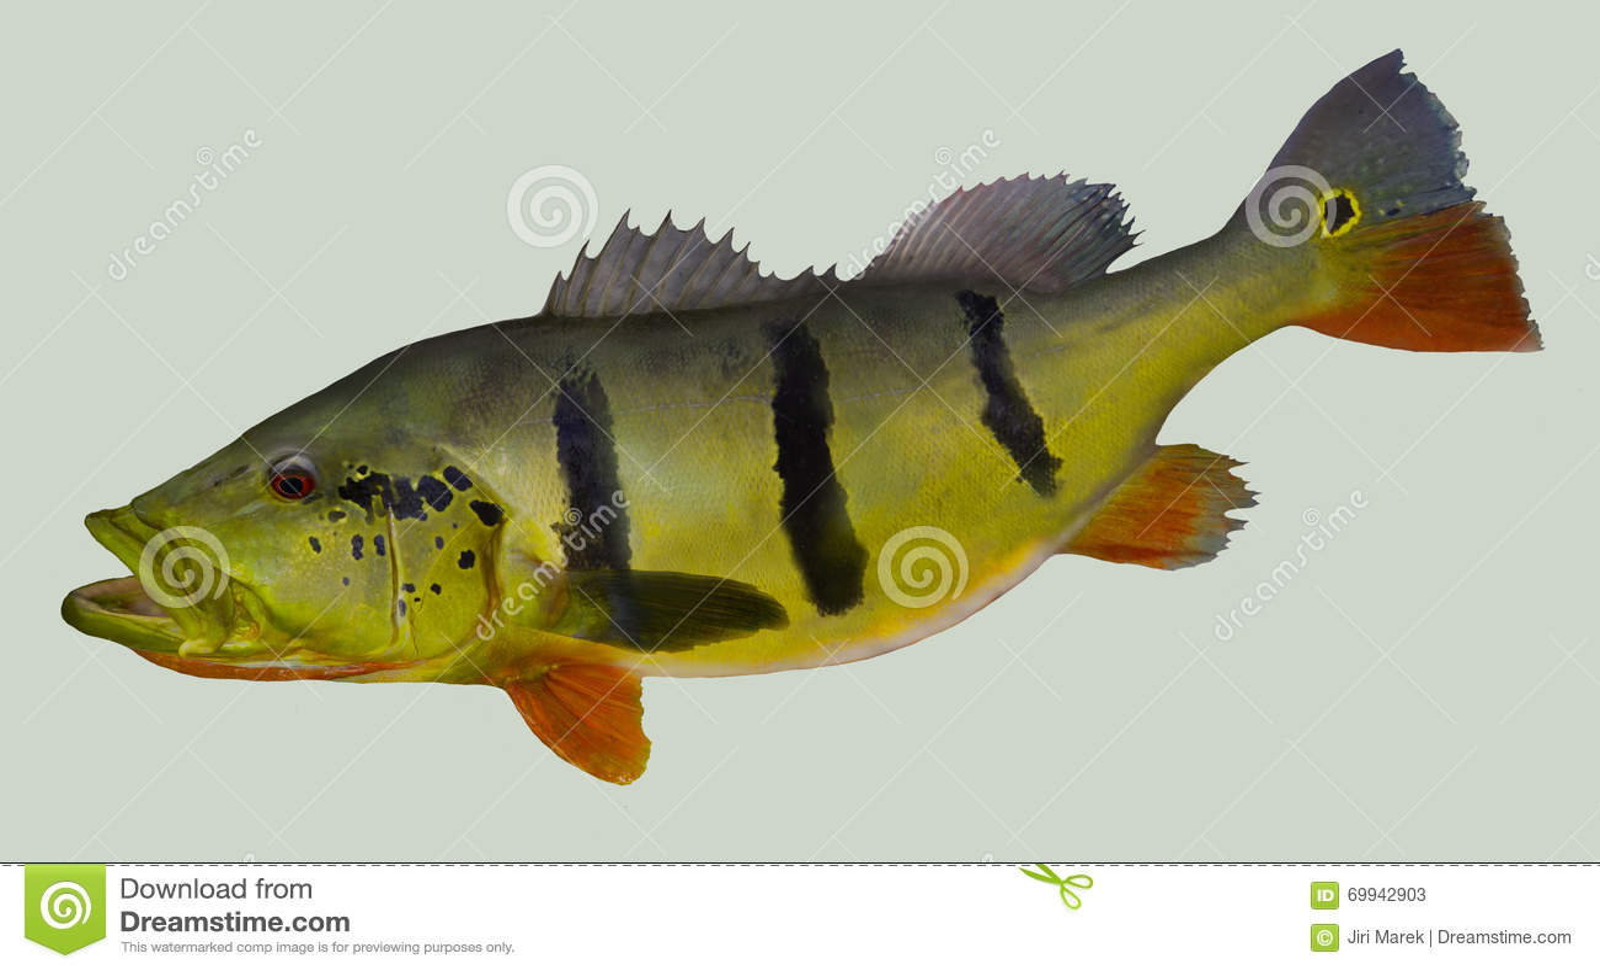 Peacock Bass Royalty-Free Stock Image